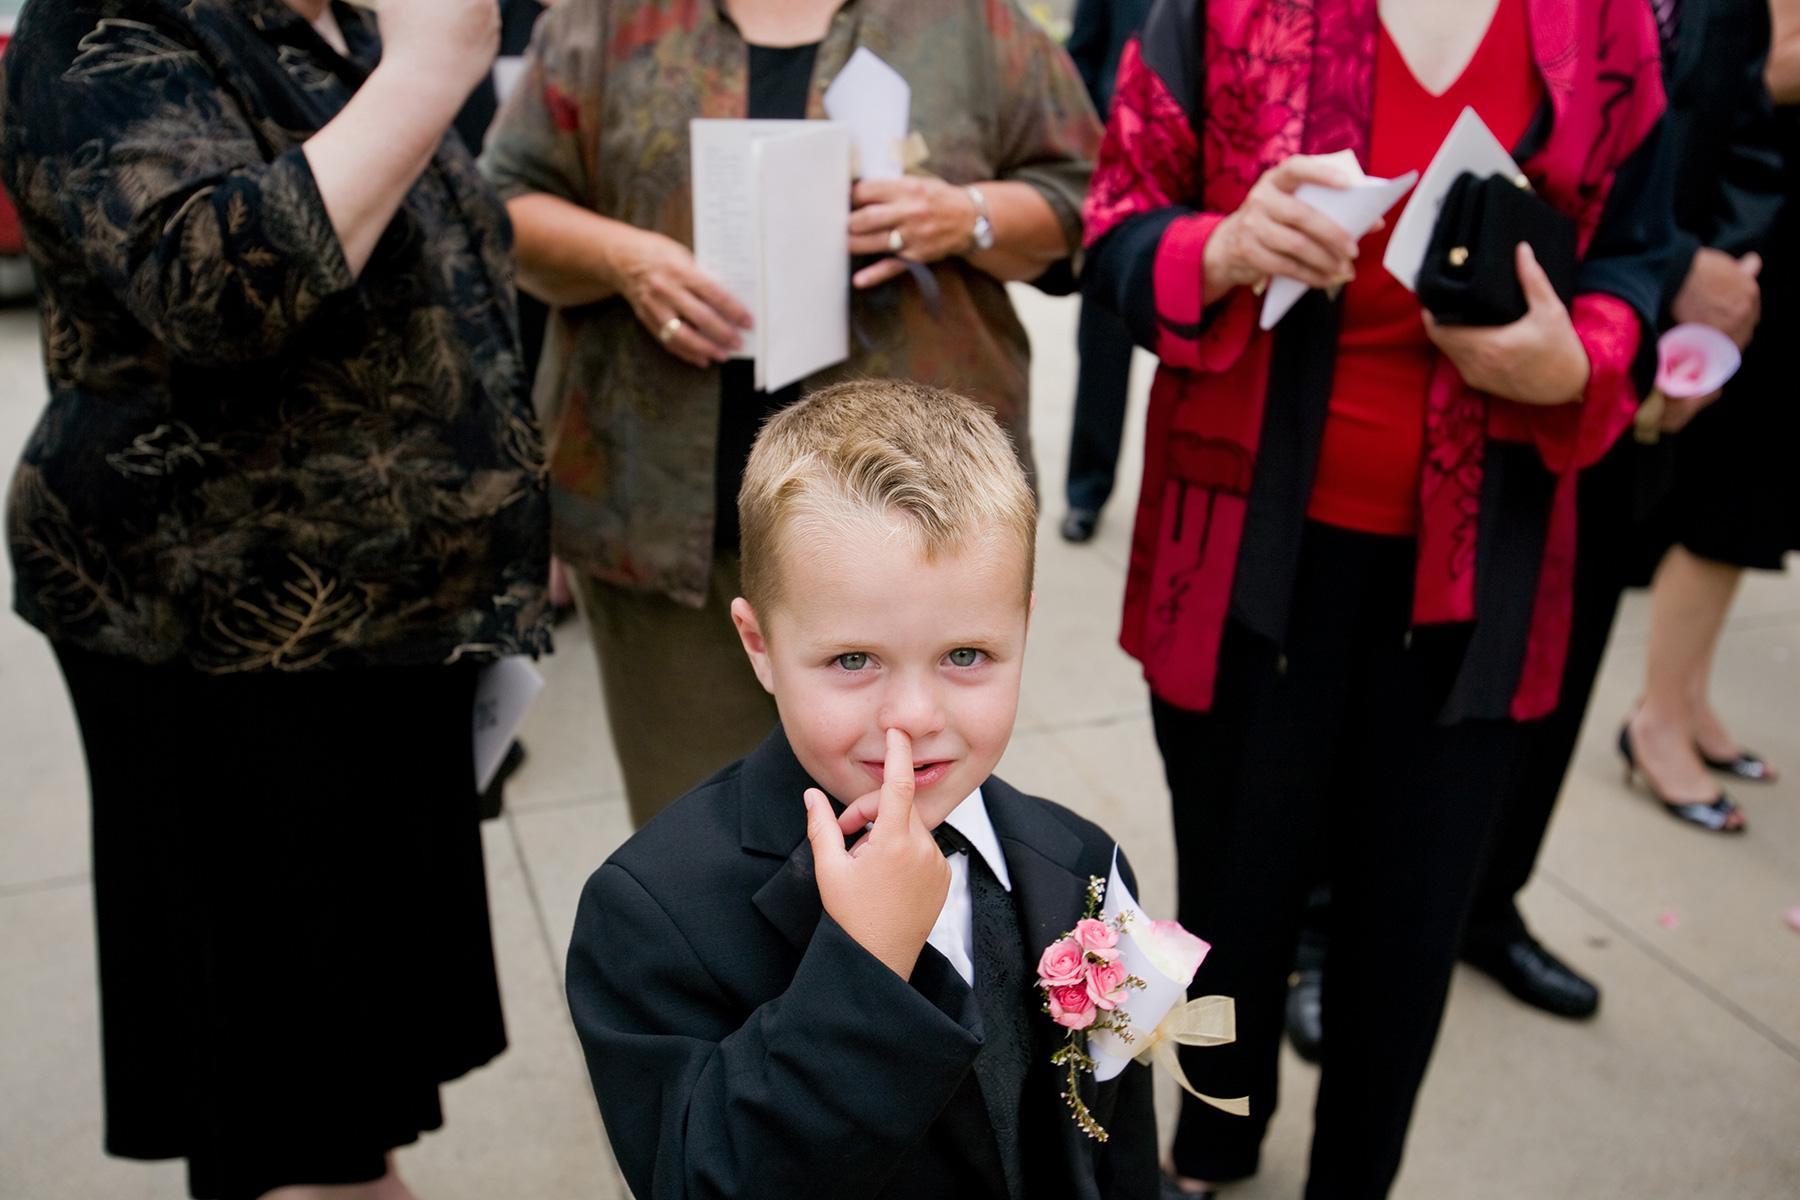 wedding-photography-saint-paul-mark-kegans-653.jpg